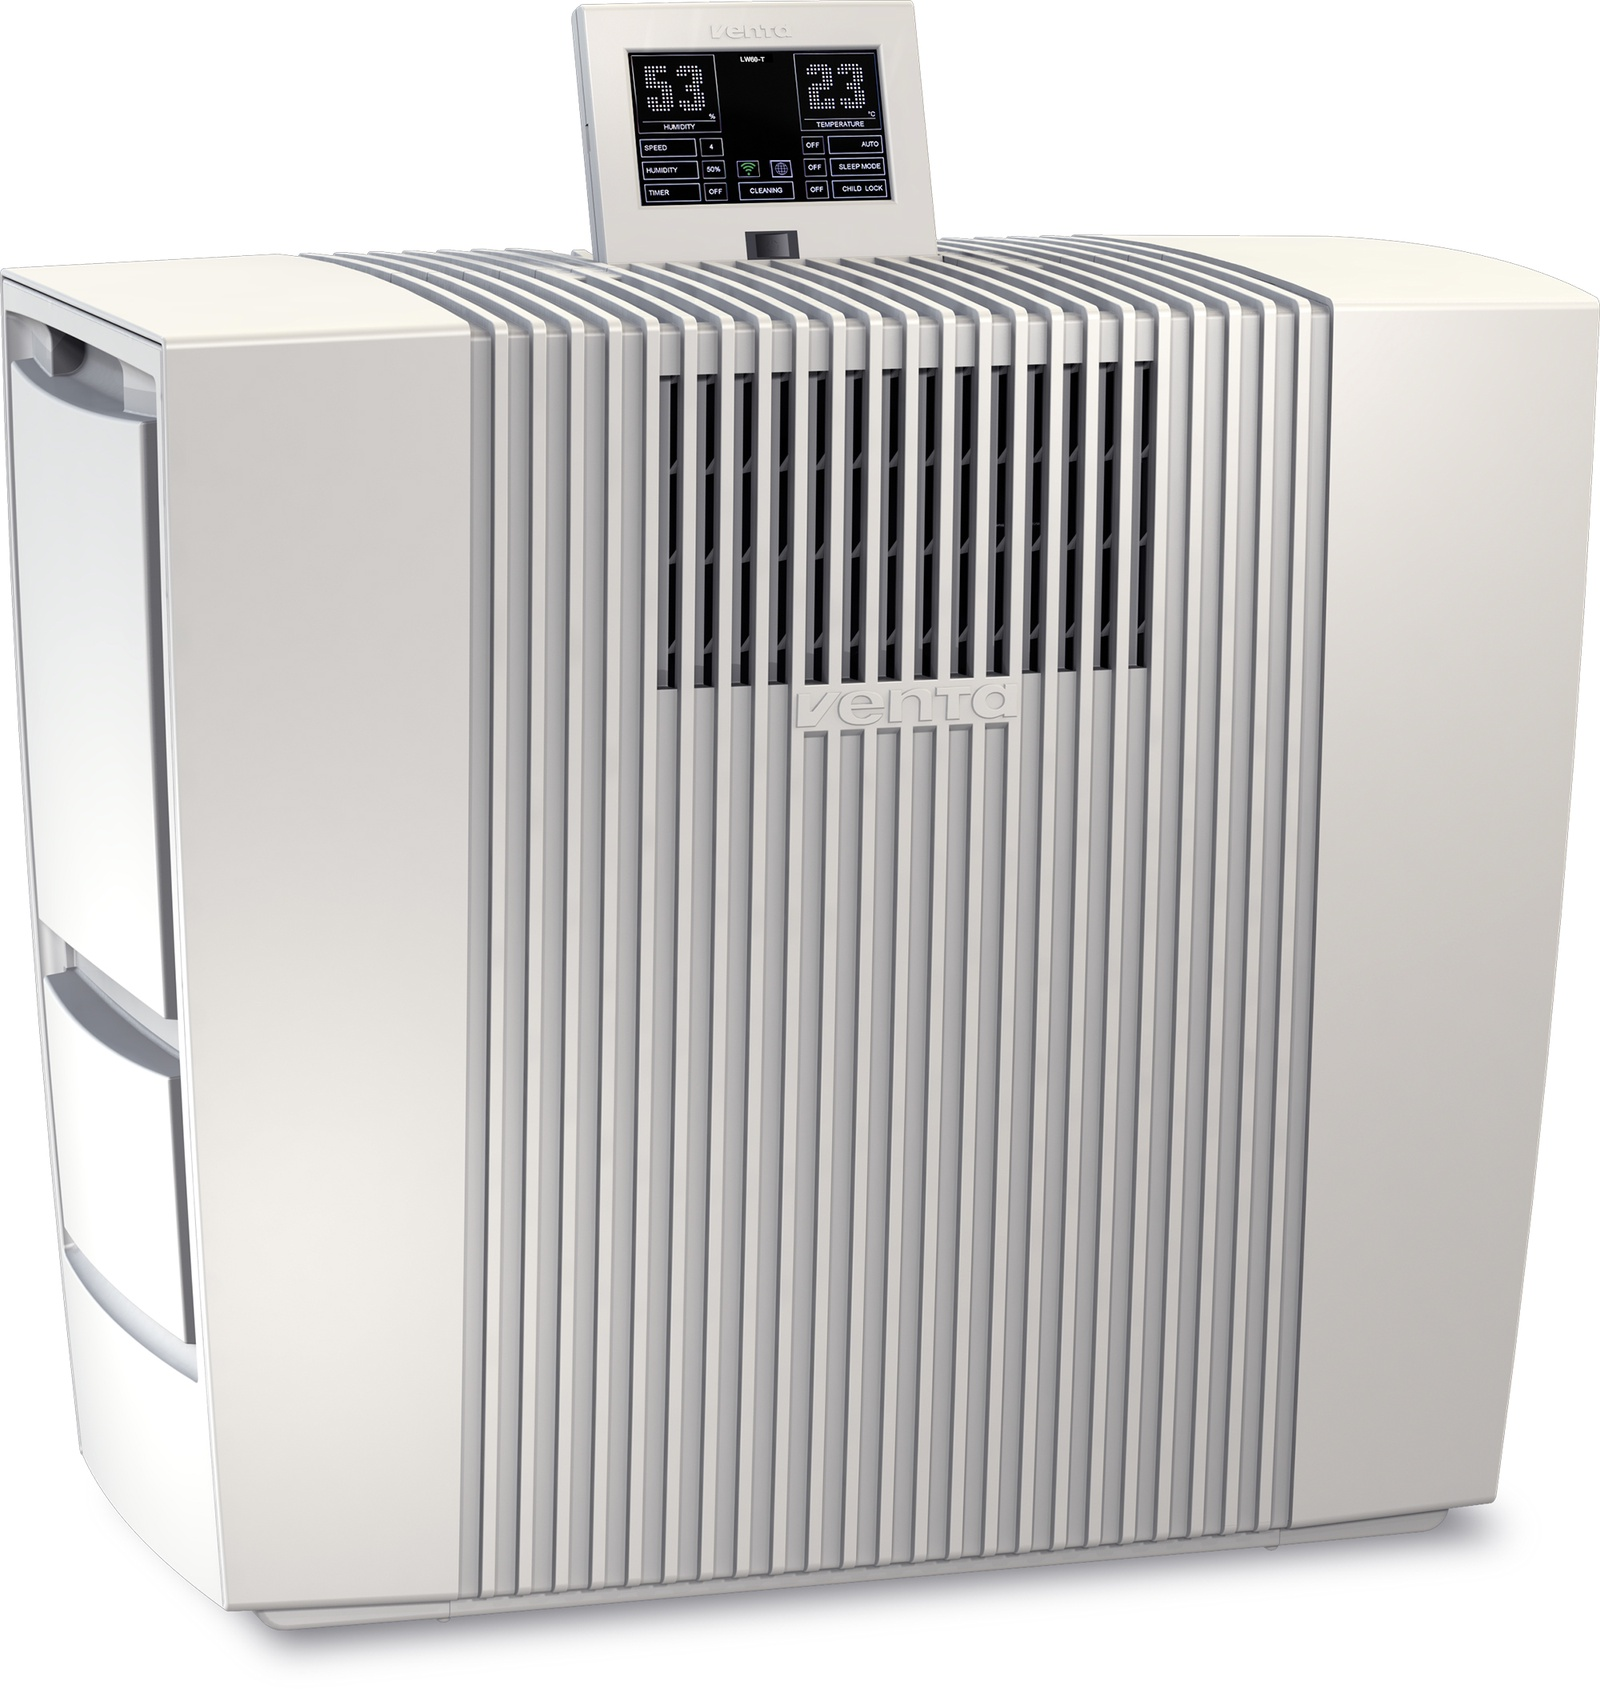 Мойка воздуха Venta Venta black/white, LW60 T Wi-Fi weiss цена